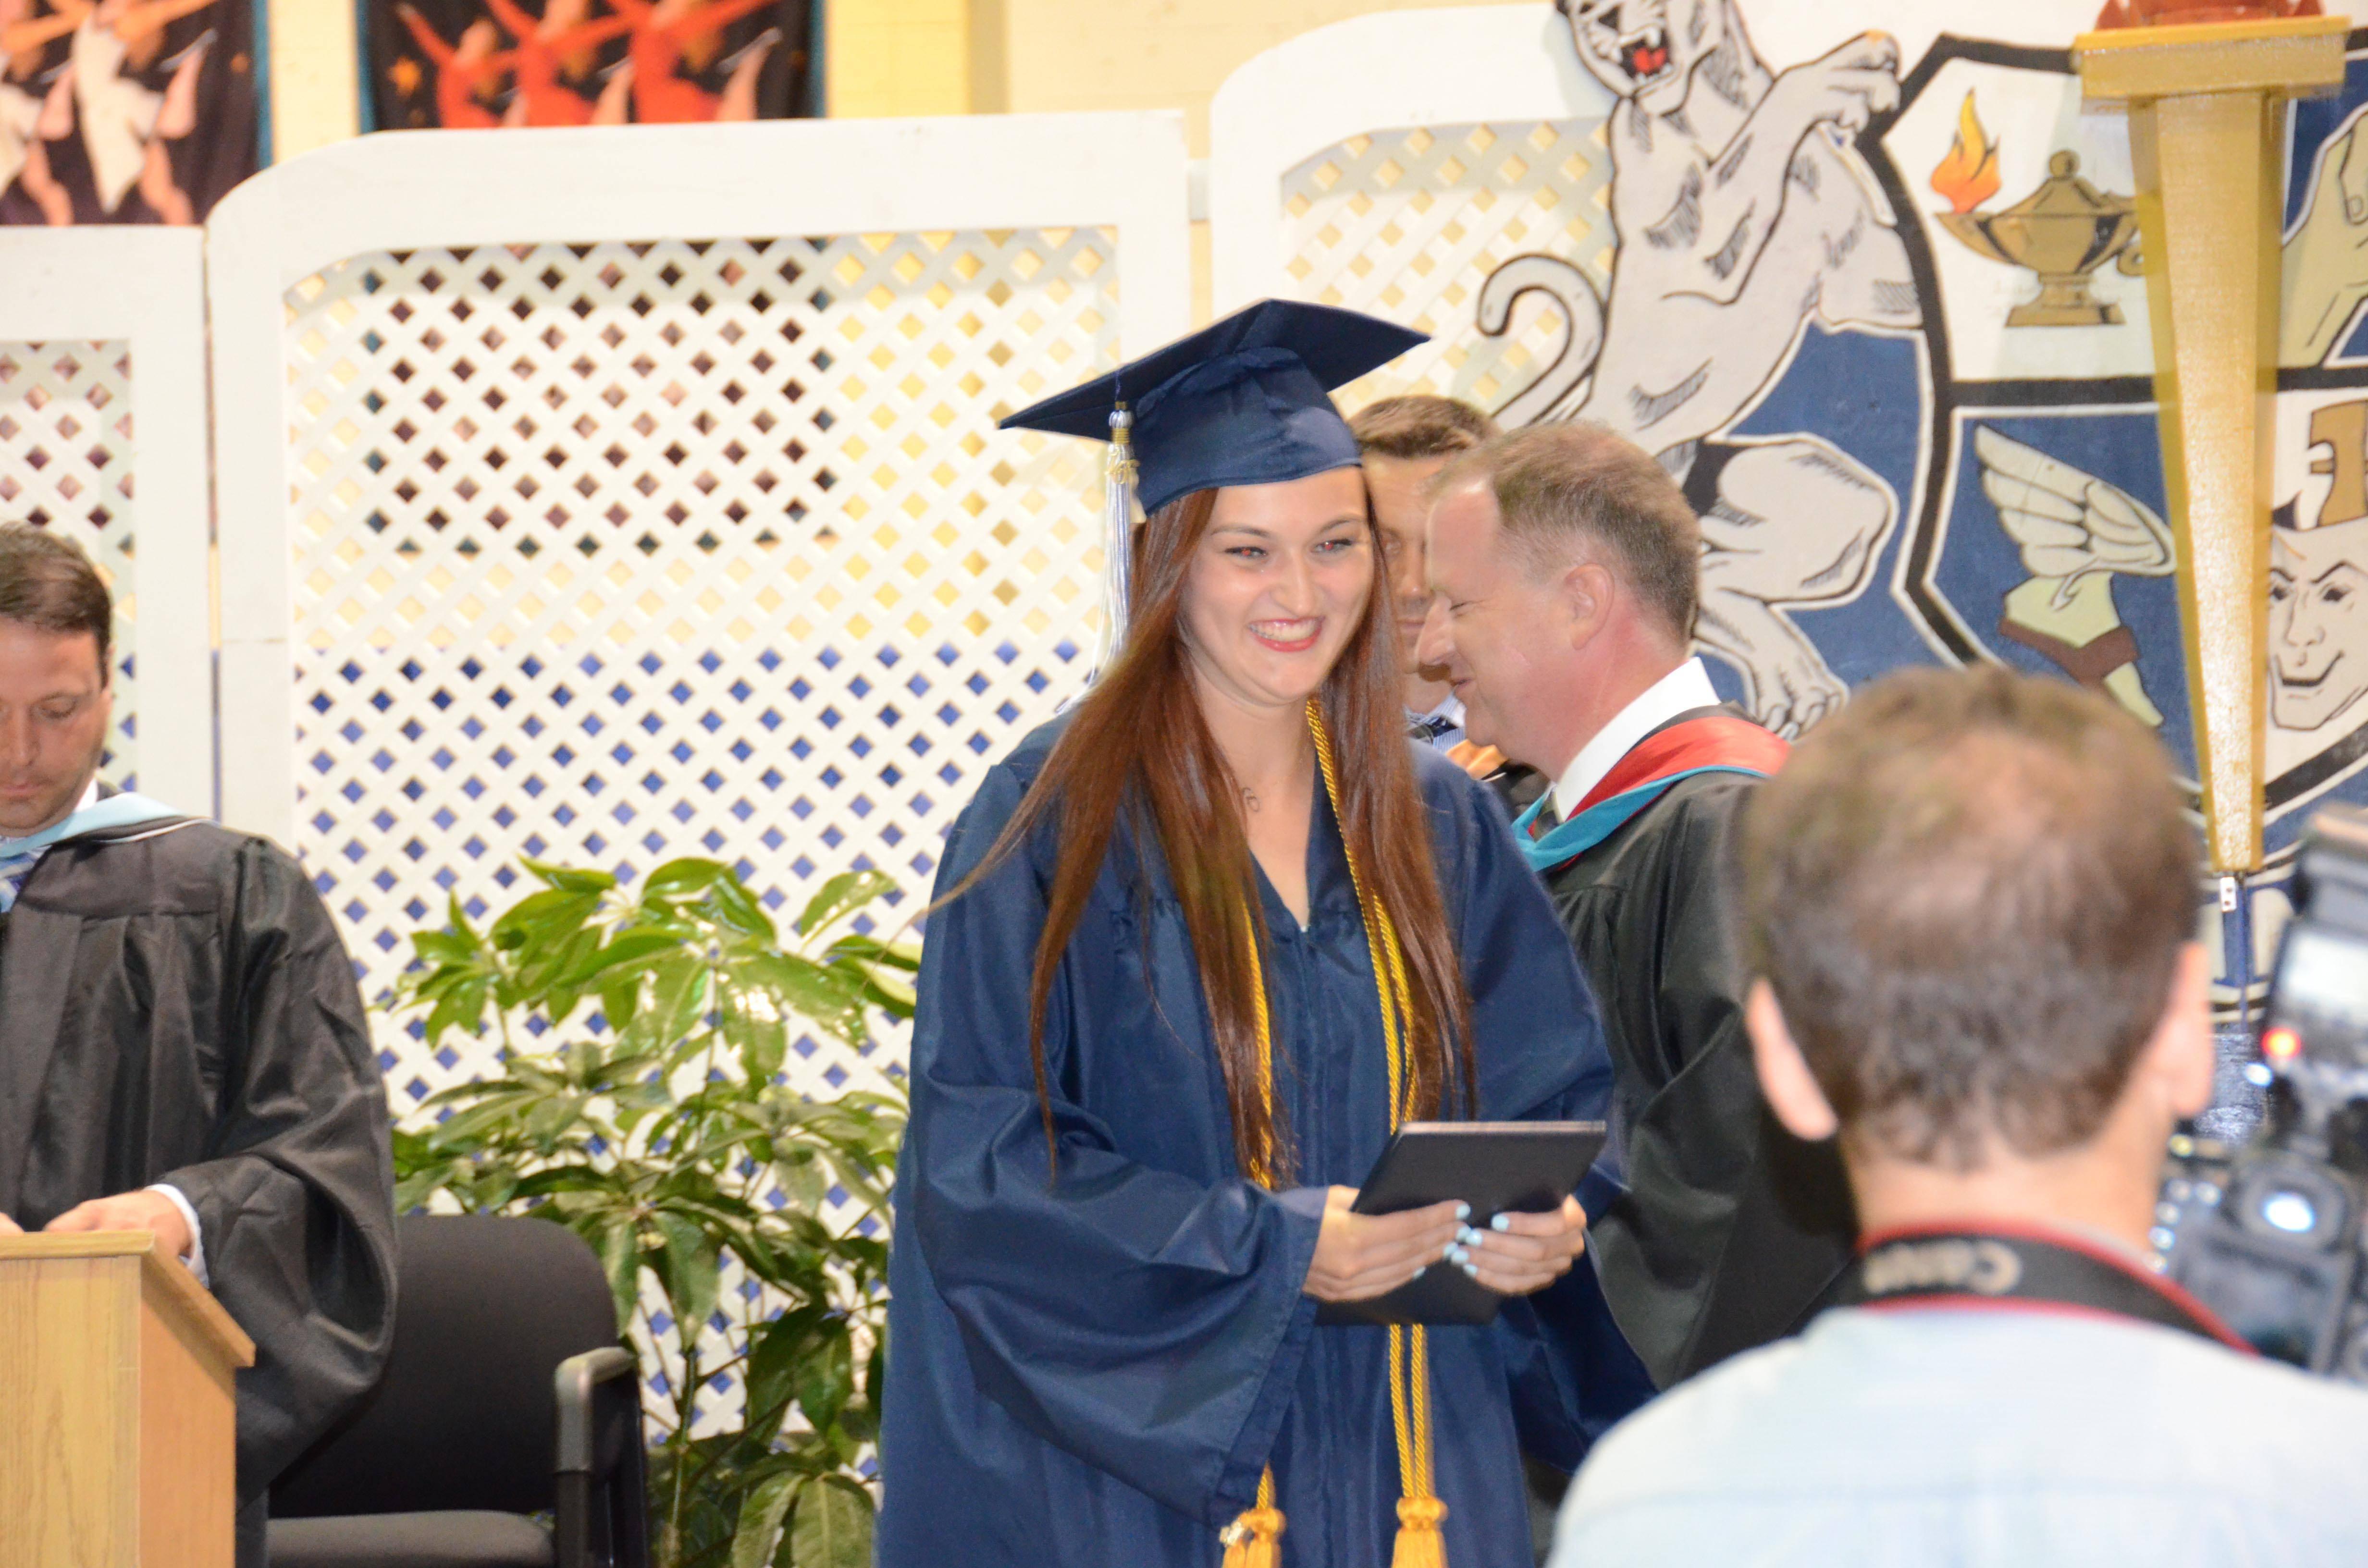 379e025c733be370afd9_CHS_Graduation_2016_ACZ_DSC_2191.jpg